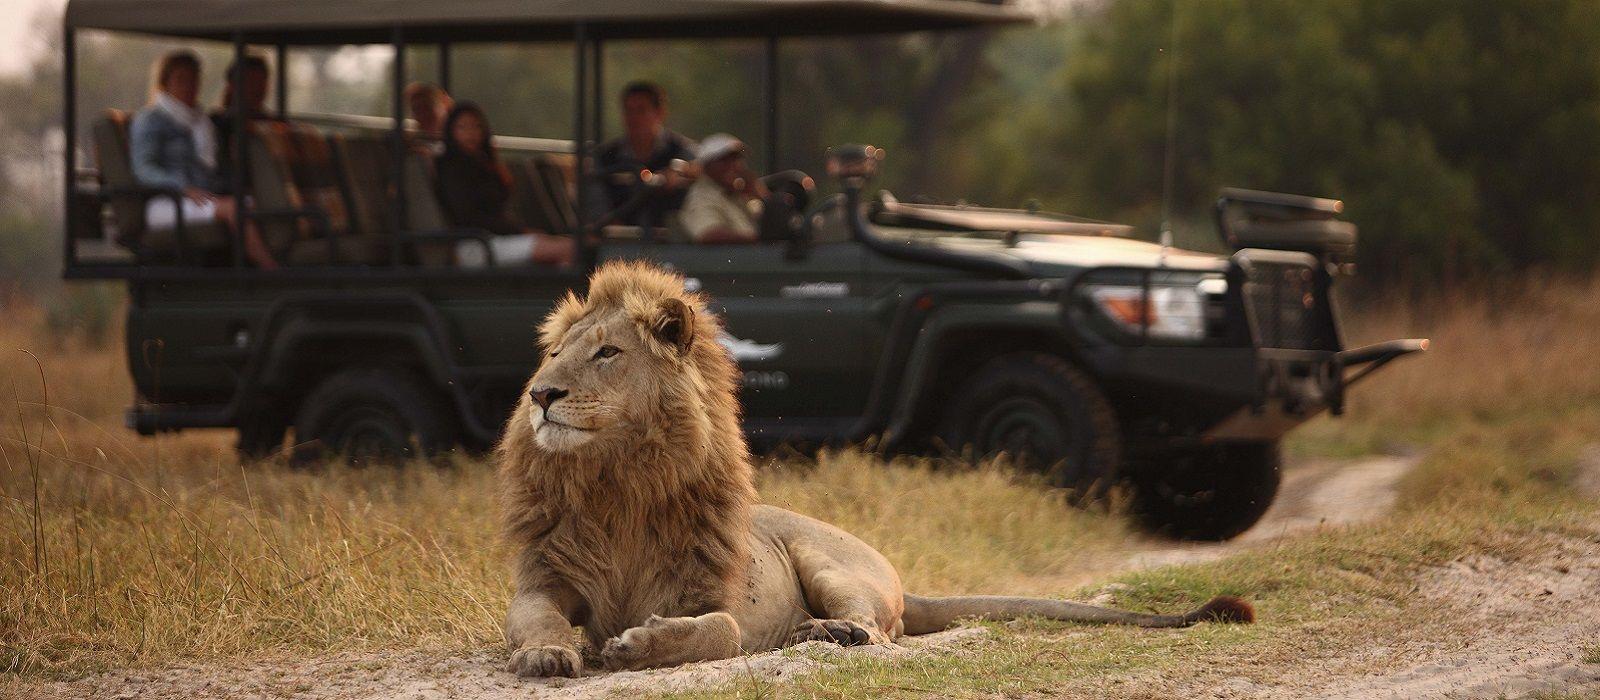 Südafrika, Simbabwe & Botswana: Wilde Tiere & glitzernde Gewässer Urlaub 2